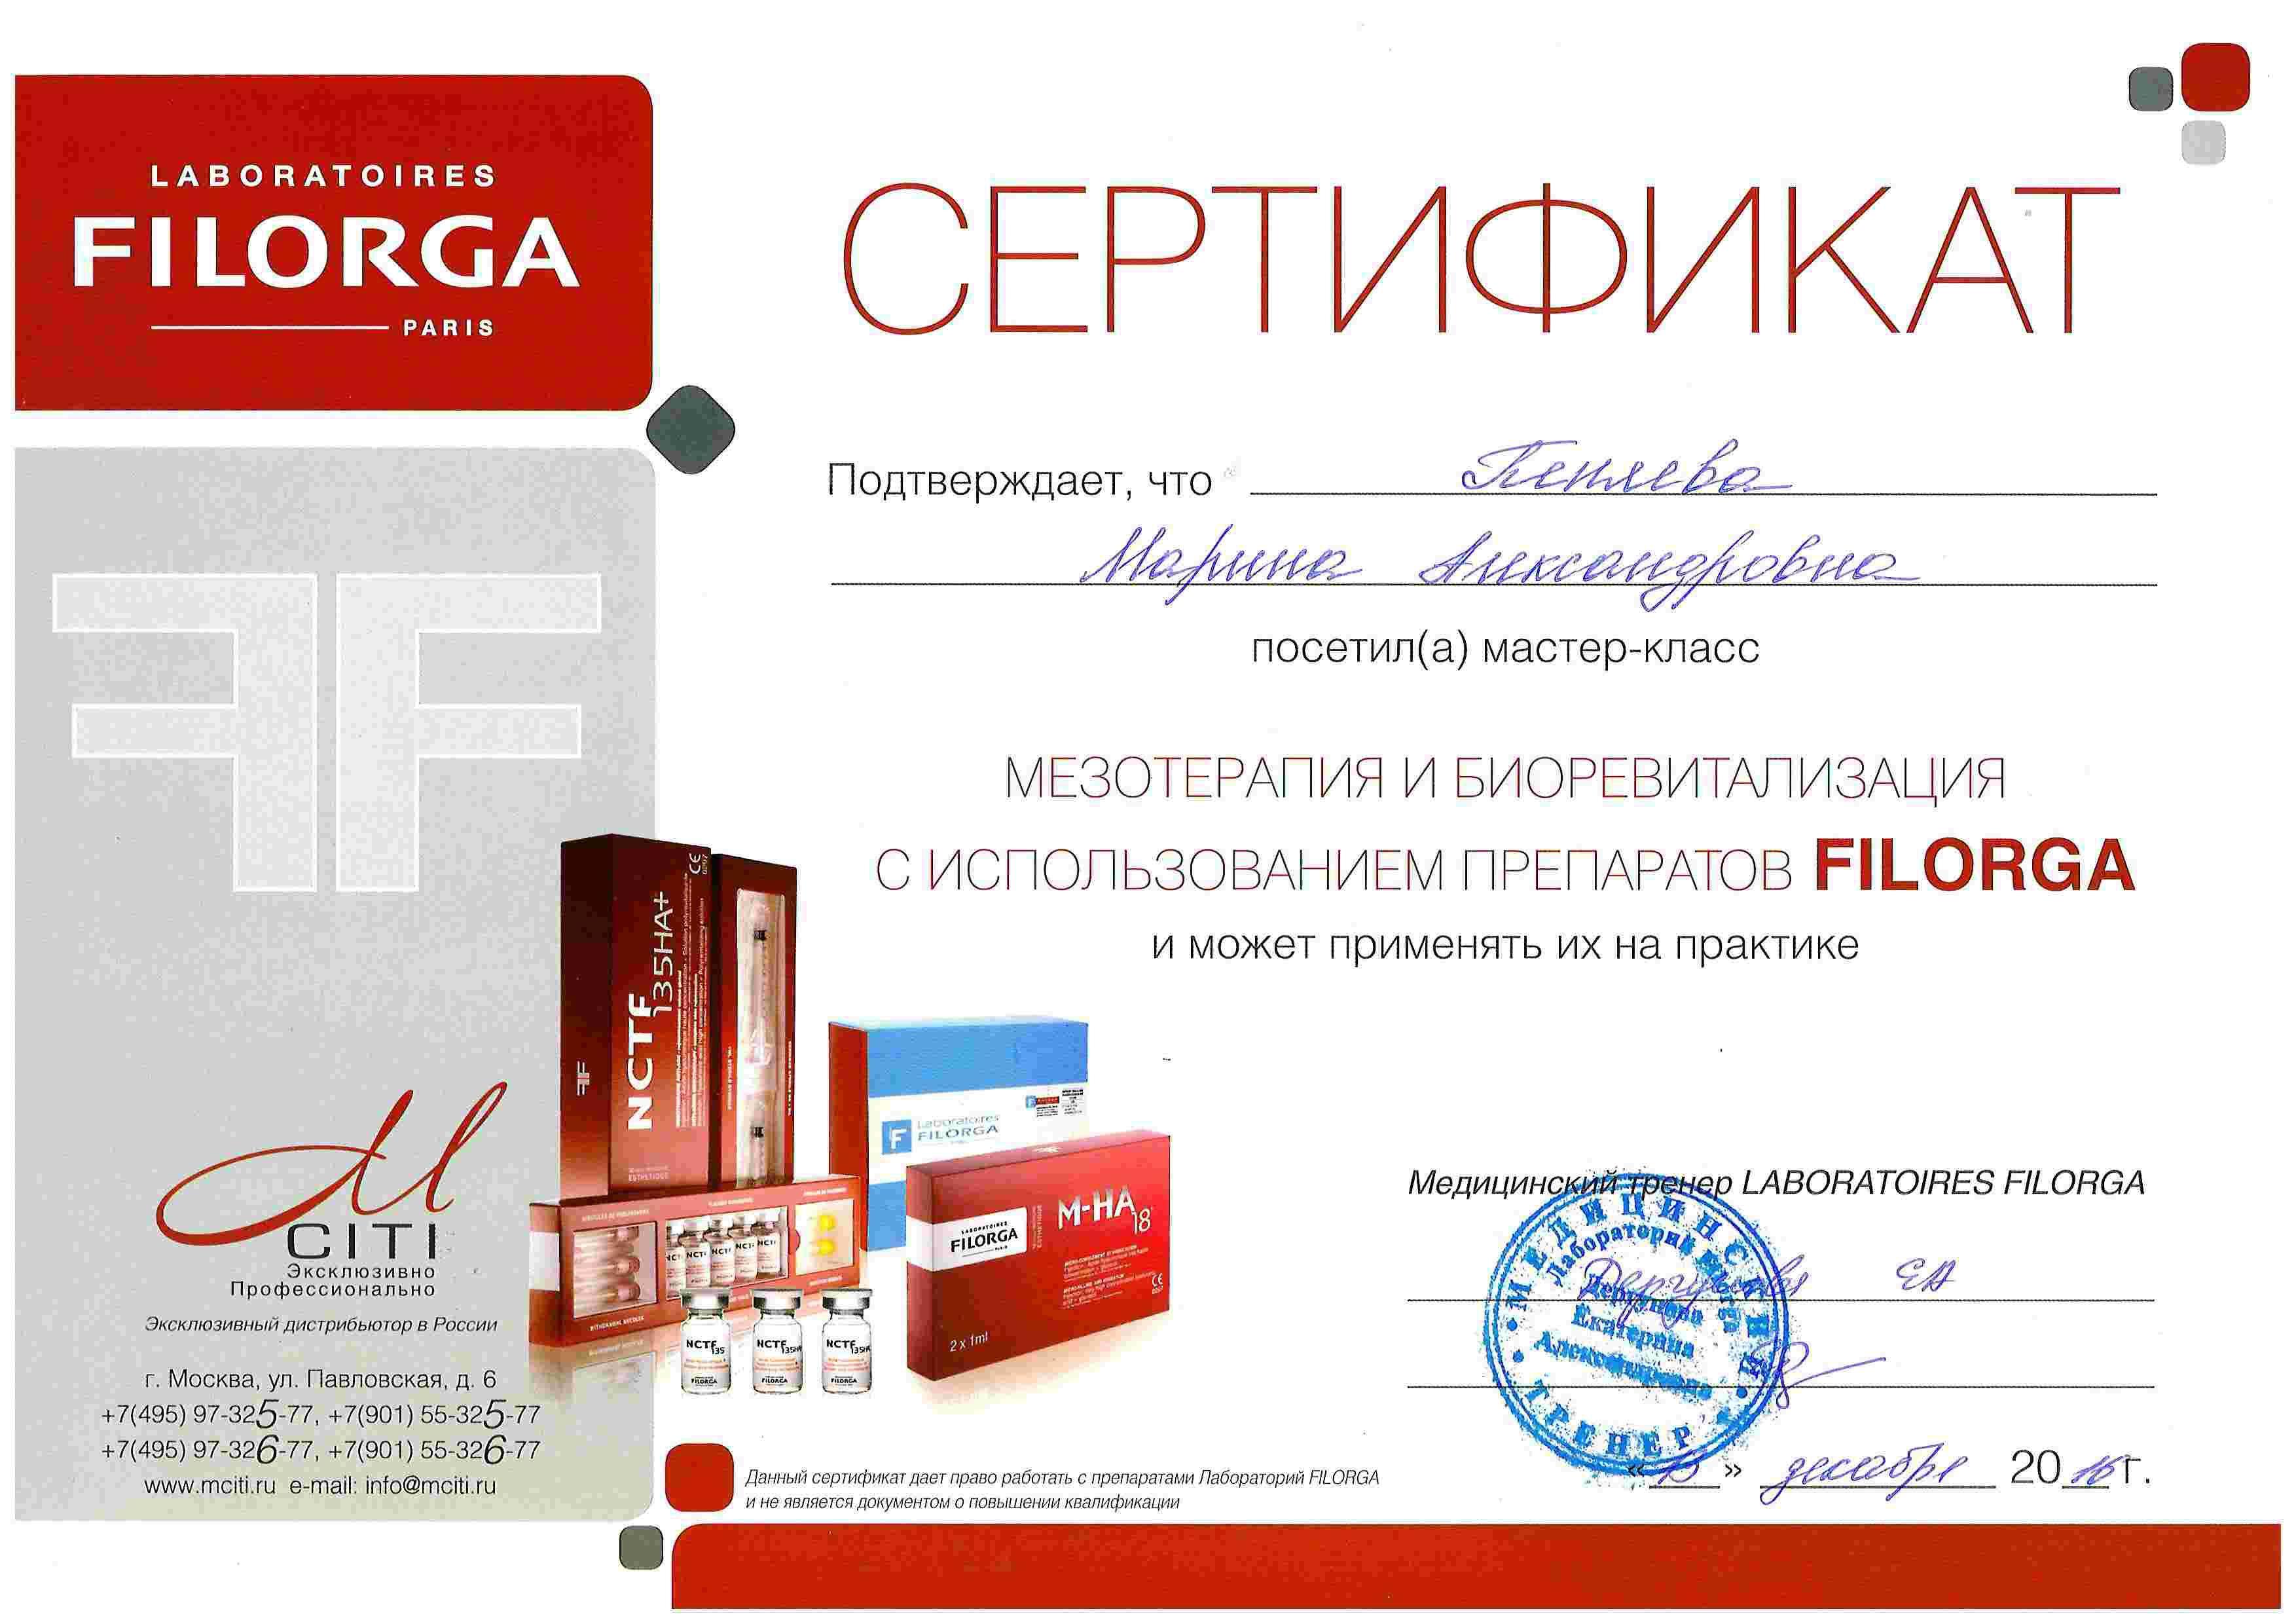 Сертификат Пеняева 9